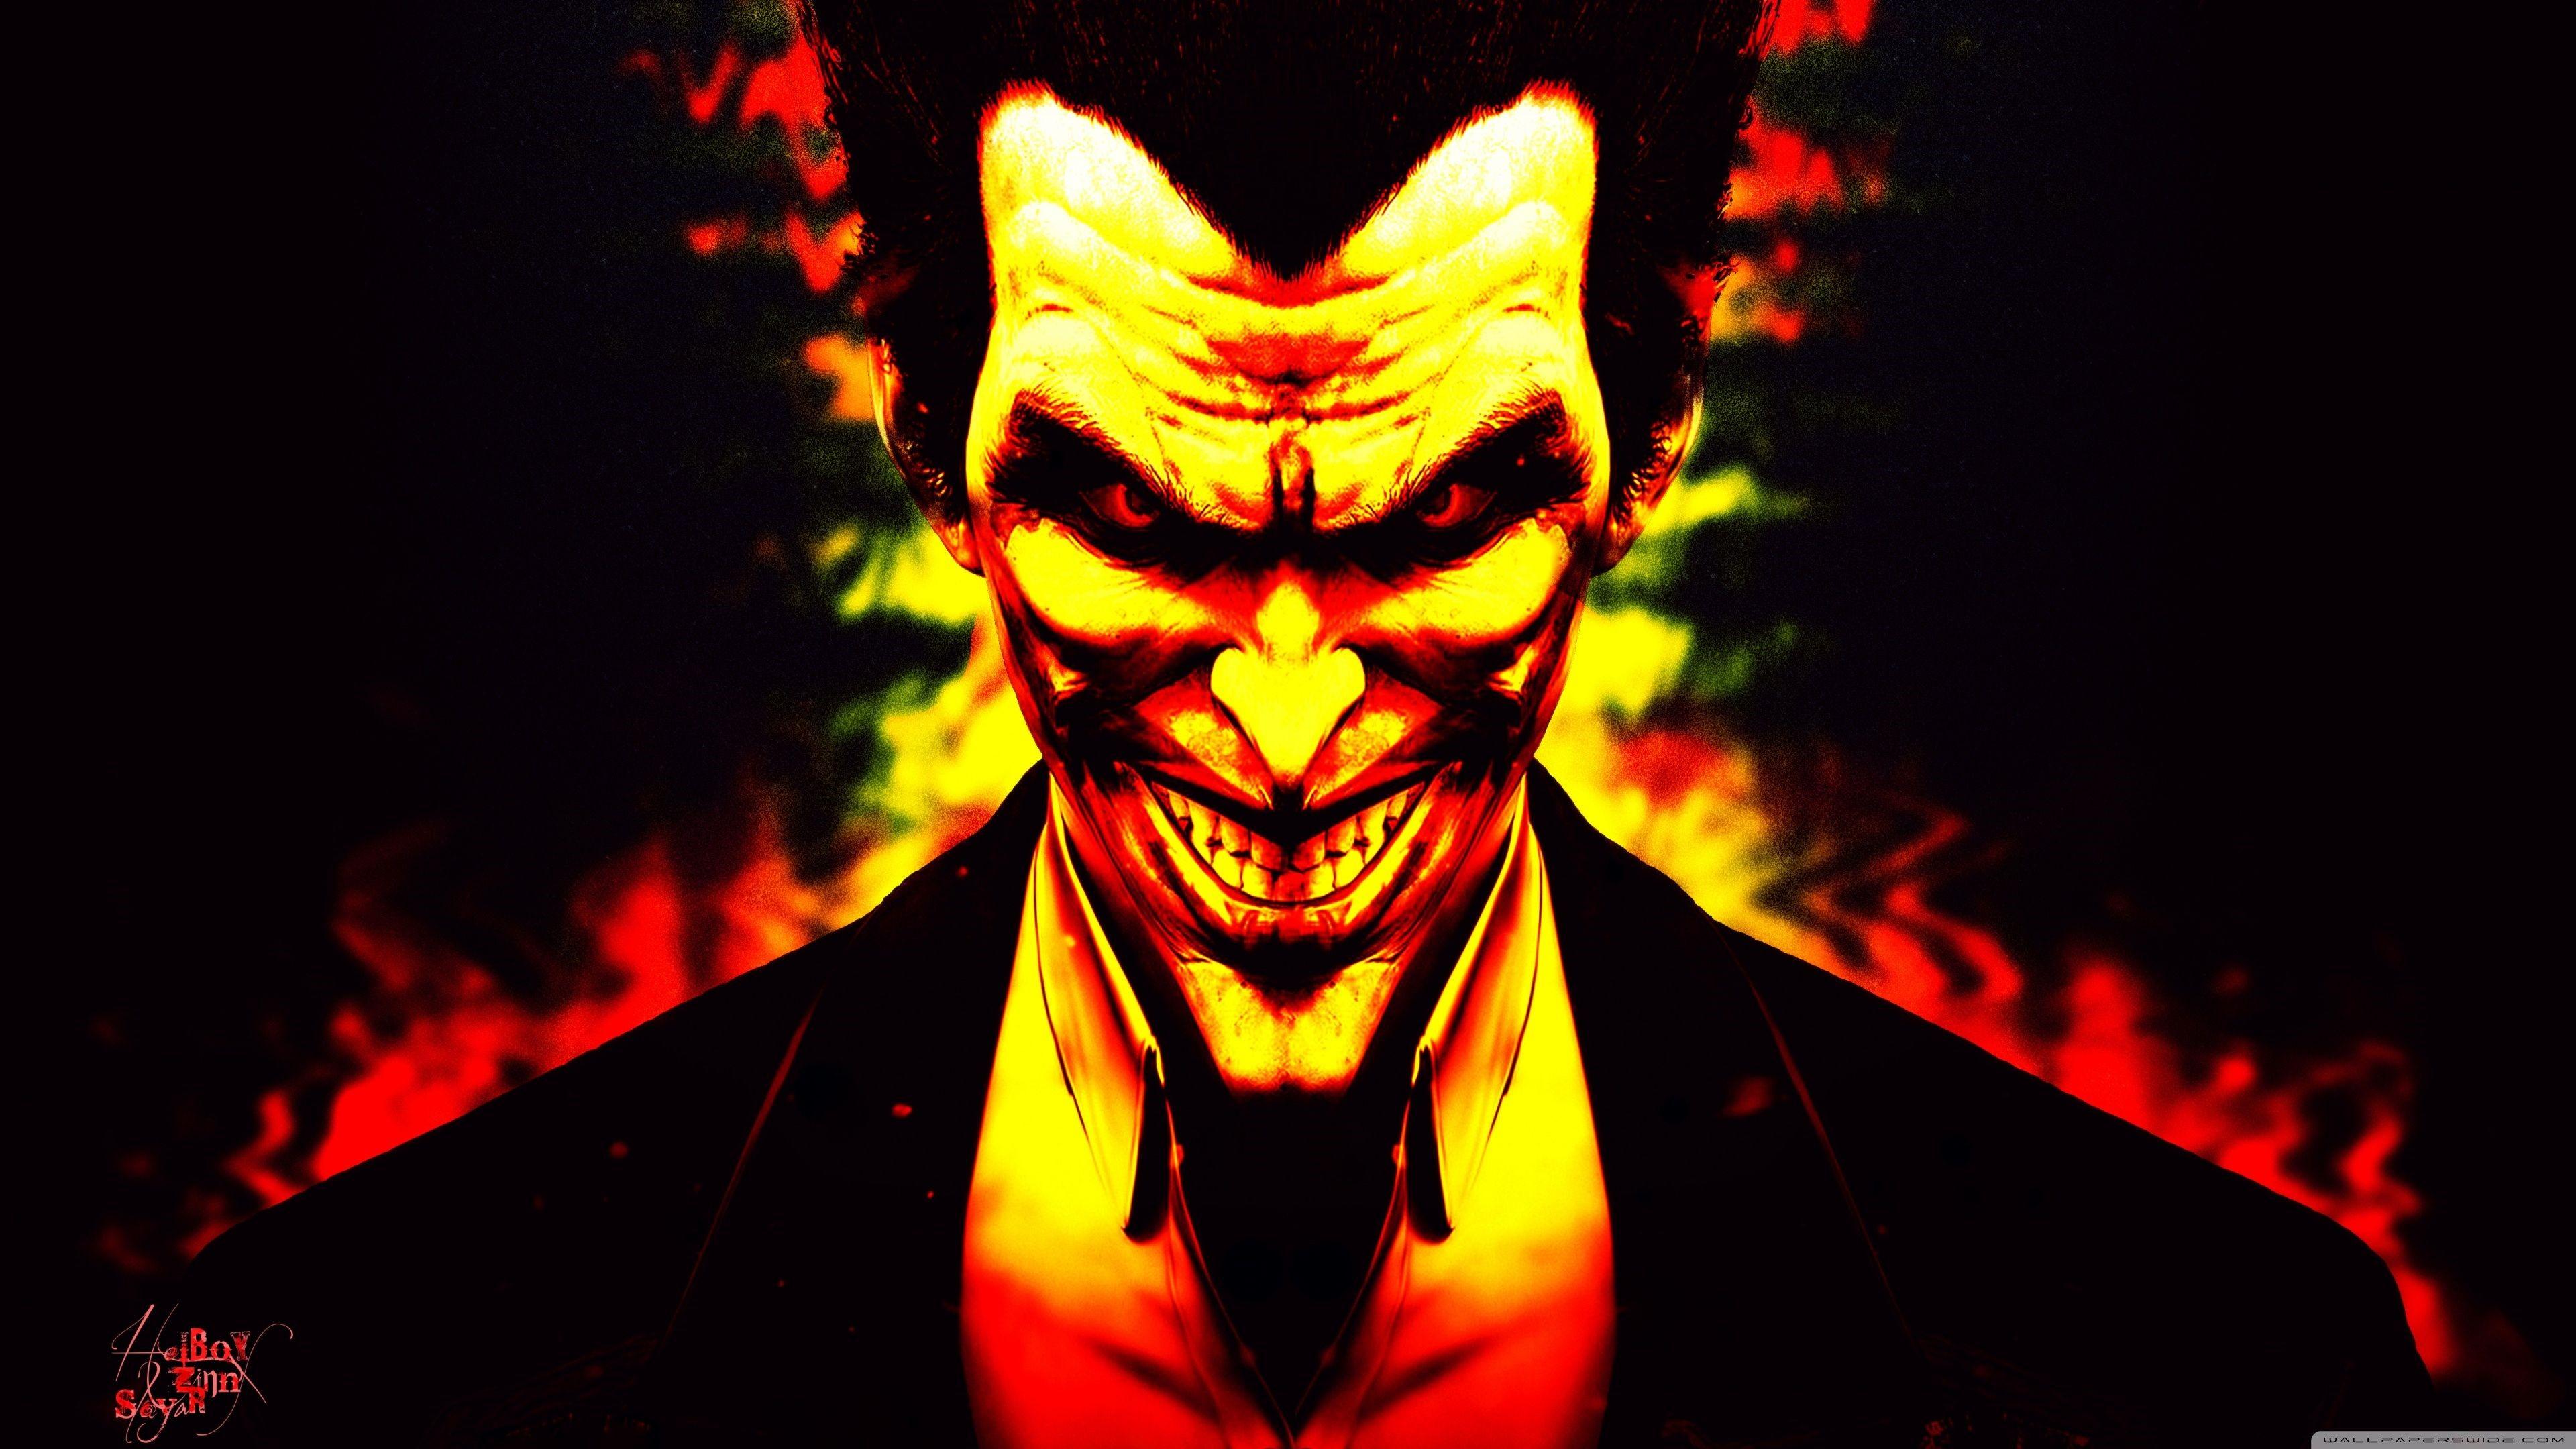 Joker Windows Background Wallpaper Download High